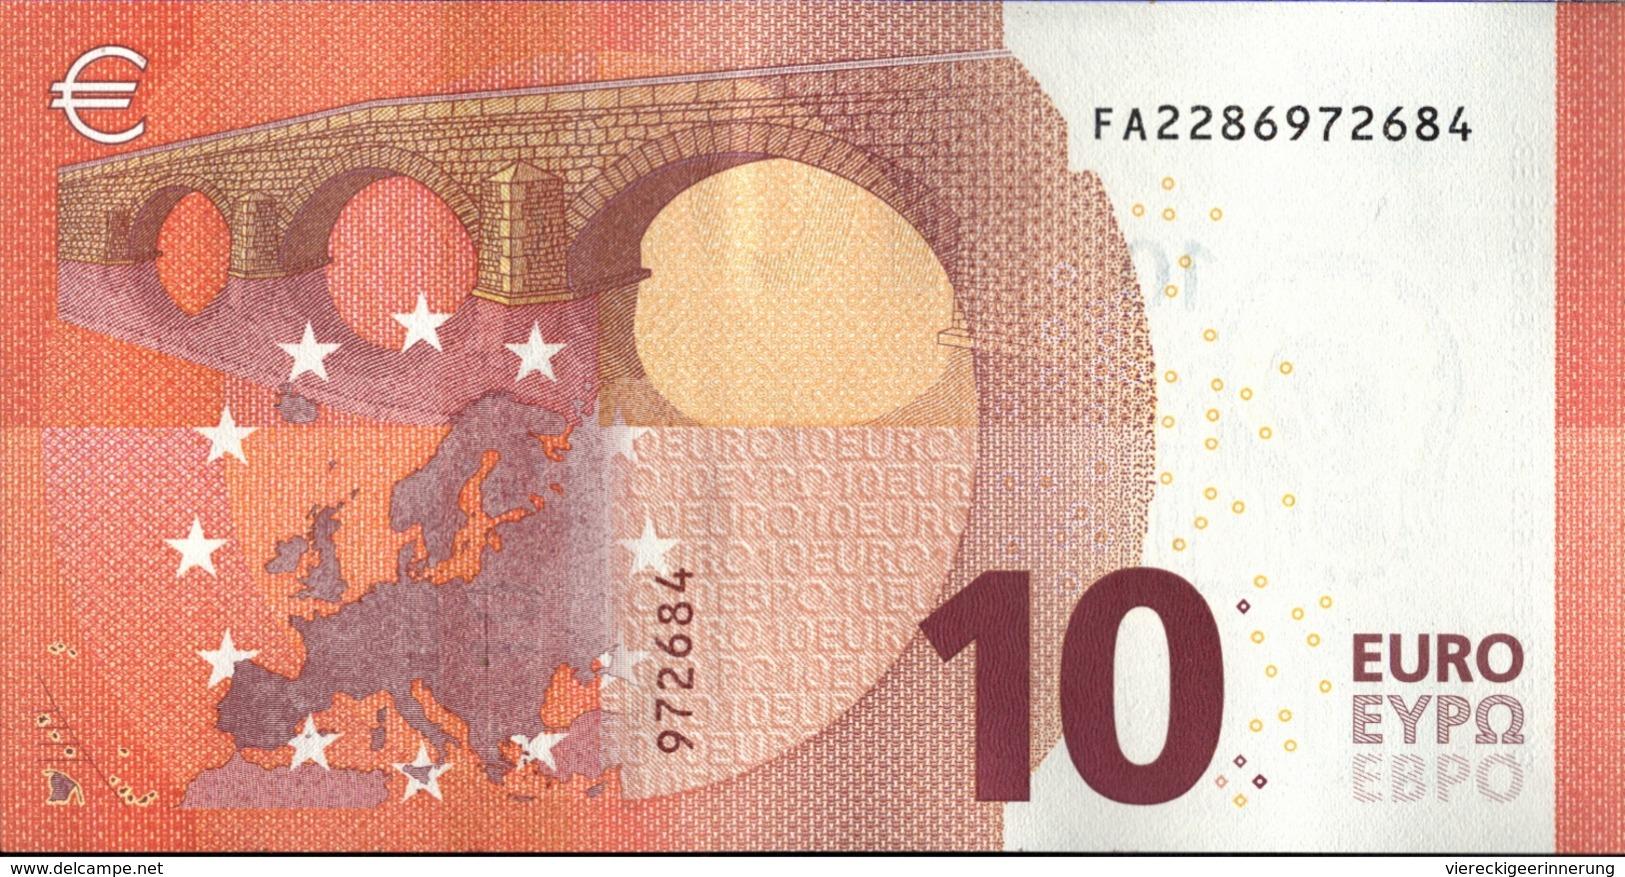 ! 10 Euro F002D1, FA2286972684, Unc., Currency, Banknote, Billet Mario Draghi, EZB, Europäische Zentralbank - EURO